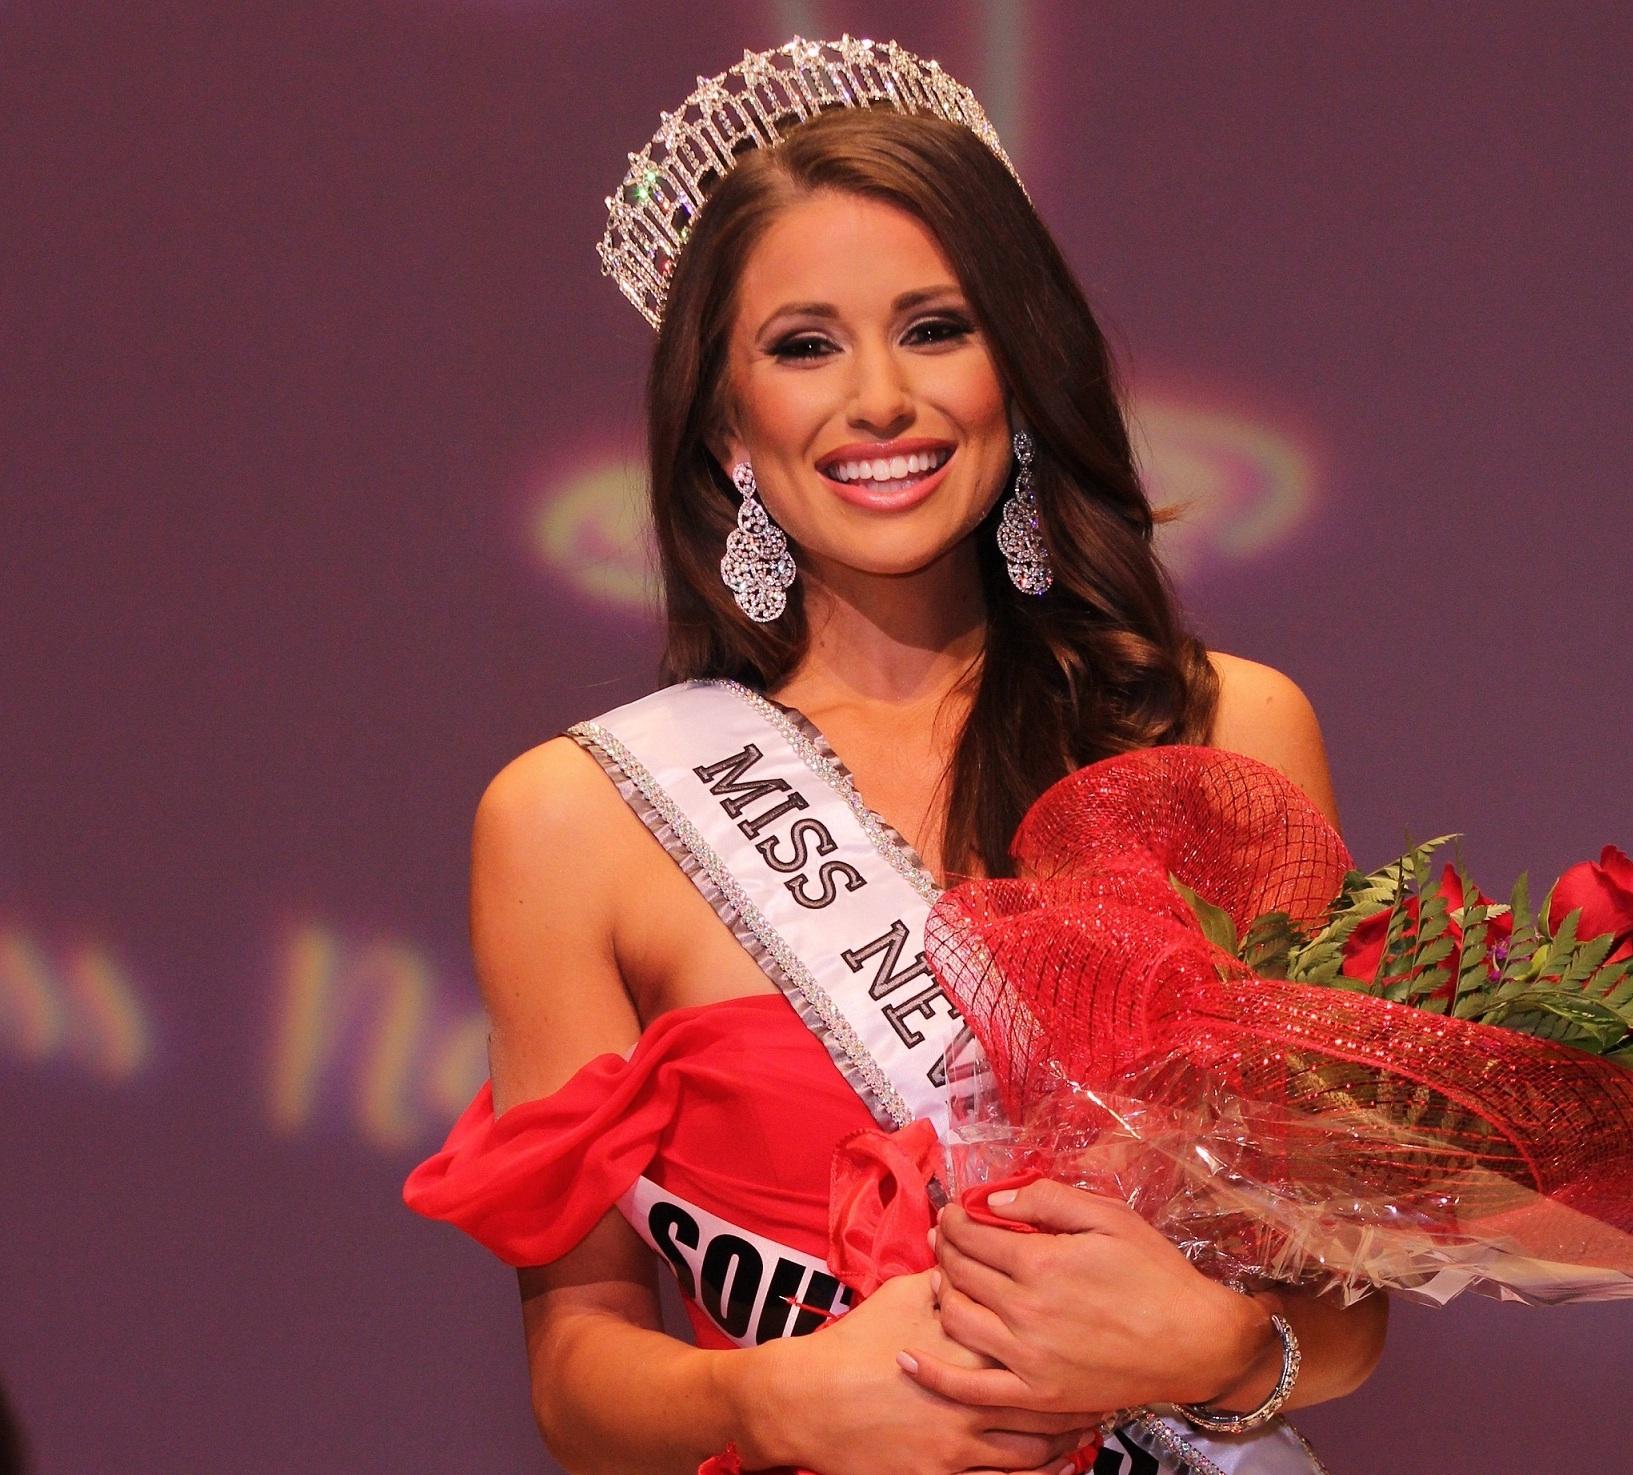 Miss Nevada USA Nia Sanchez